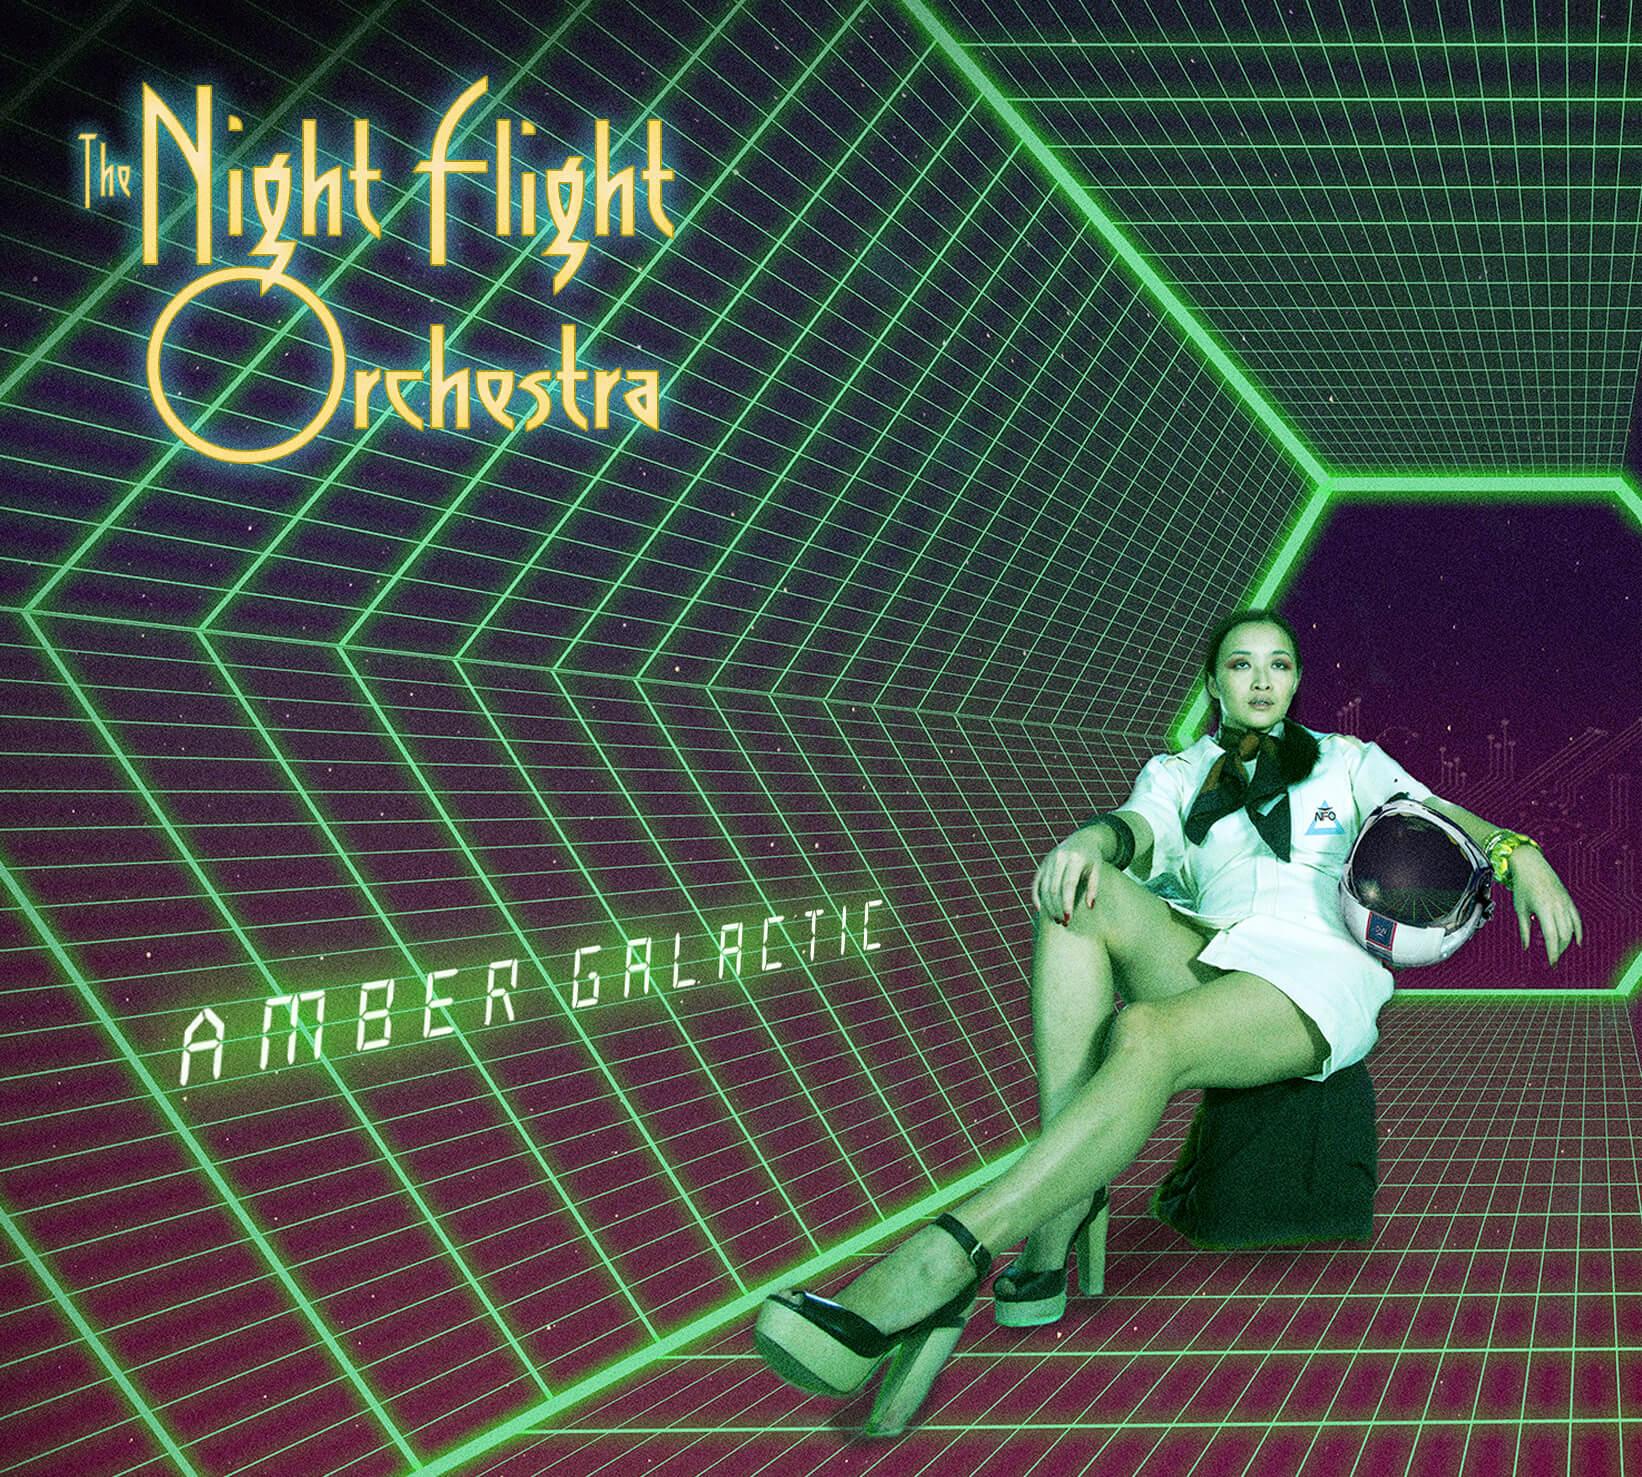 Night Flight Orchestra - Amber Galactic (Double Black LP)